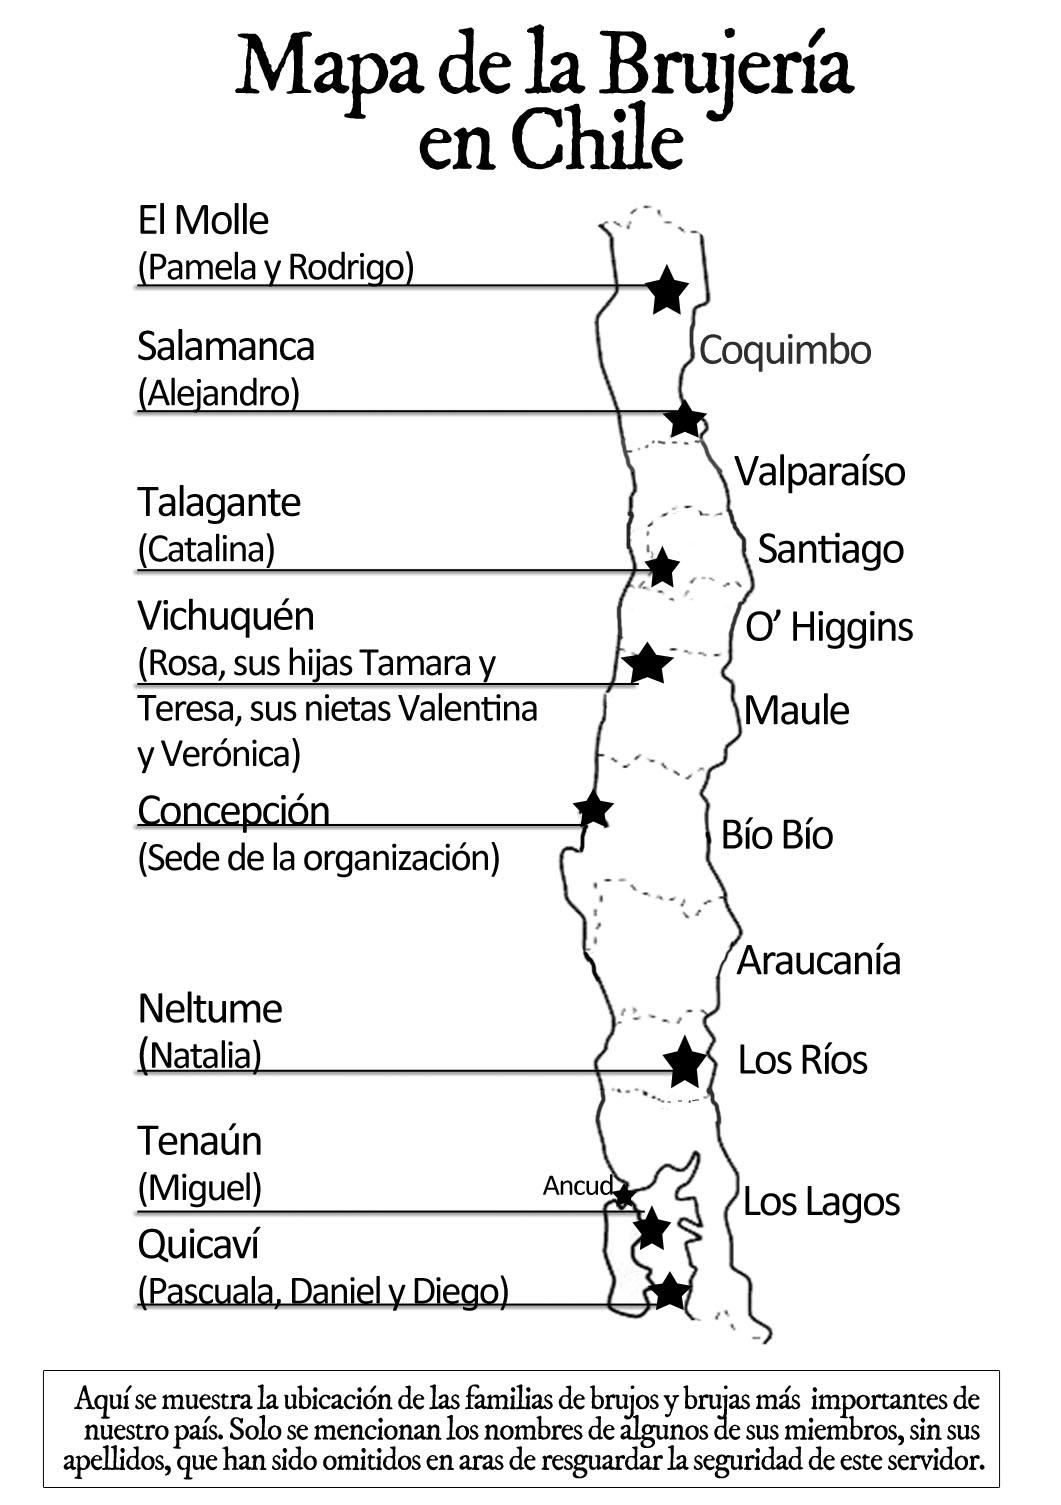 5-Mapa.jpg